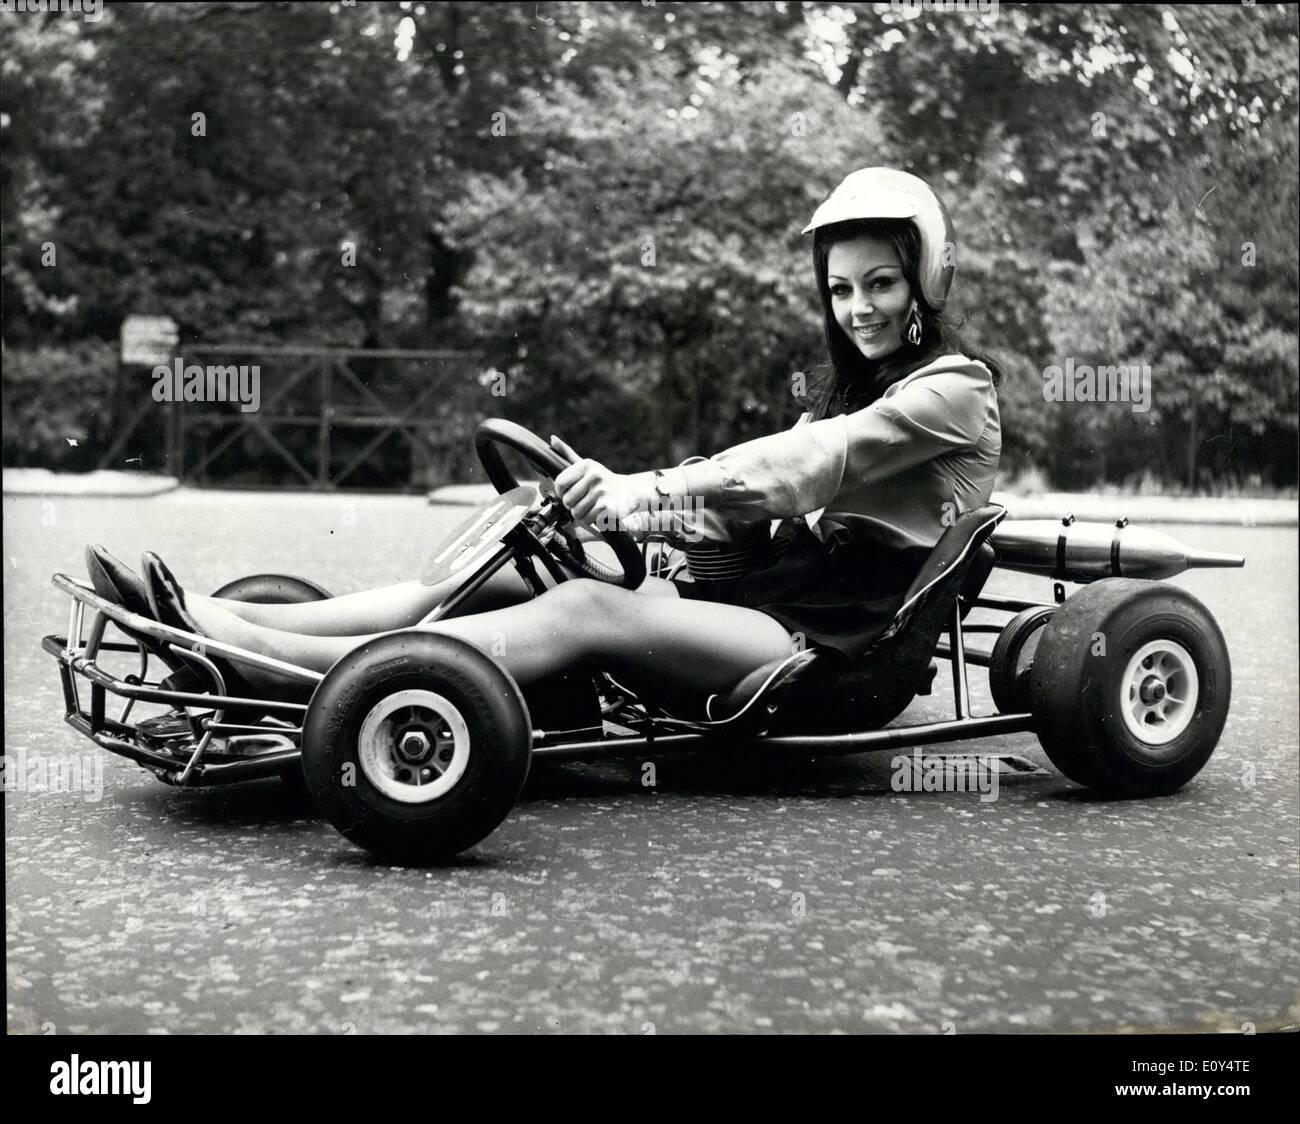 Historic Karts Stock Photos & Historic Karts Stock Images - Alamy